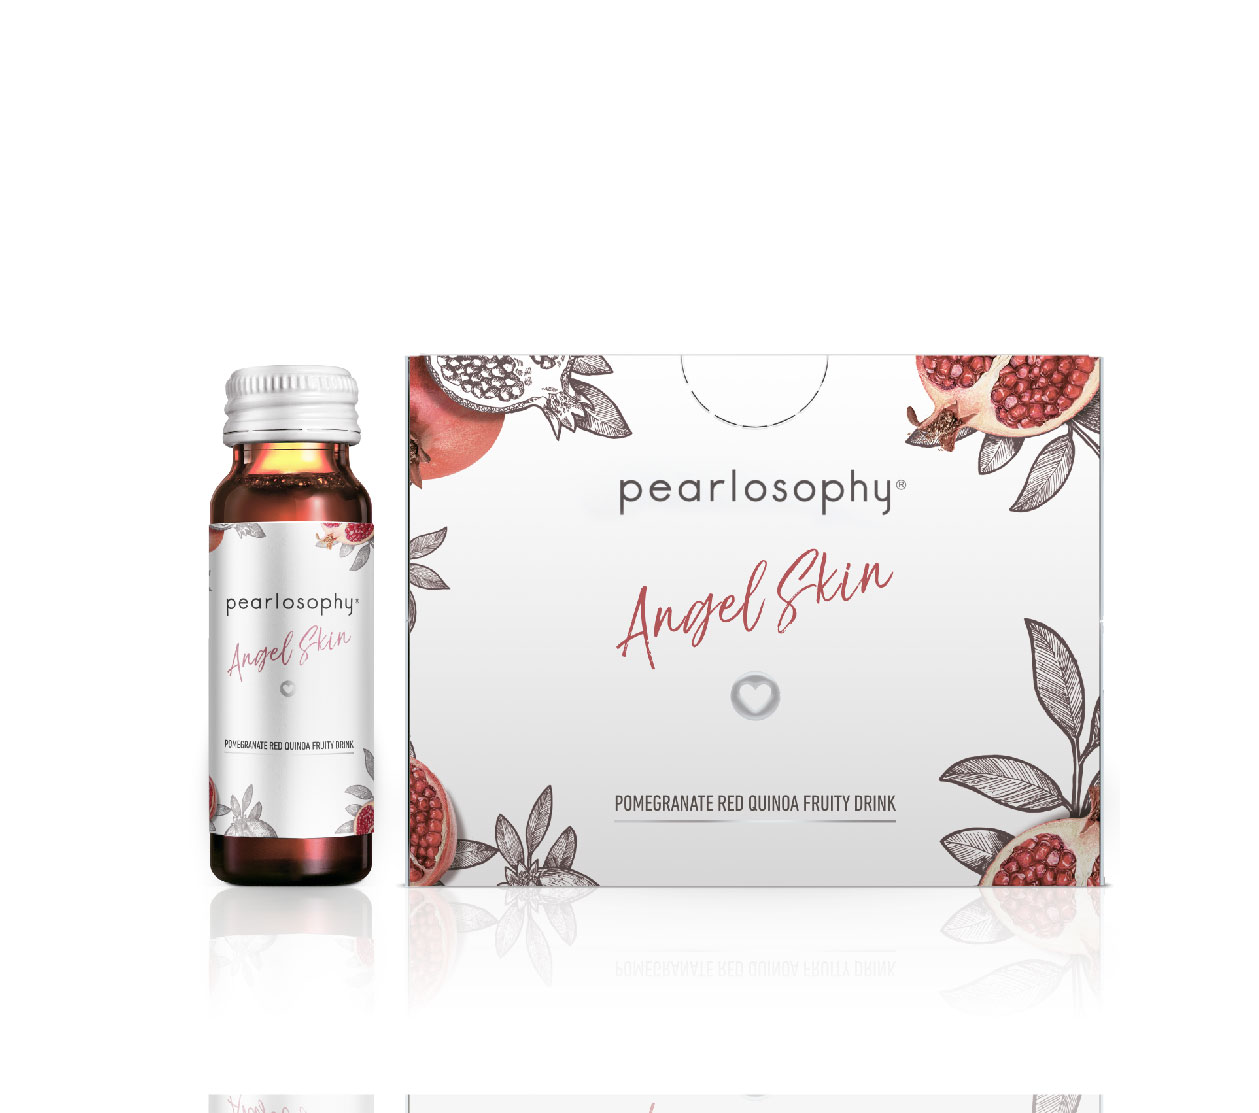 石榴红藜果蔬饮料Pomegranate Red Quinoa Fruity Drink